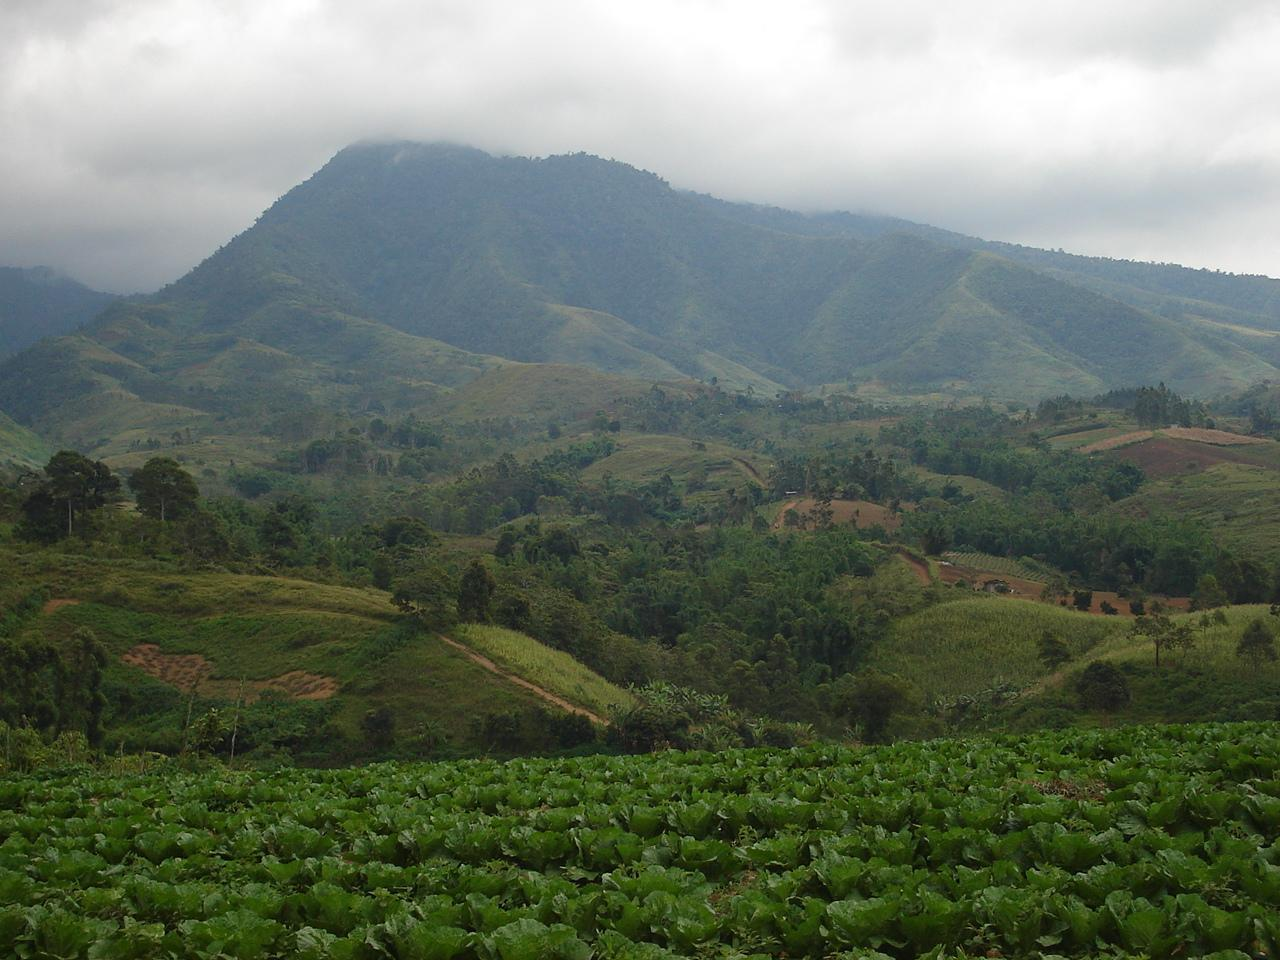 Monte Kitanglad Range